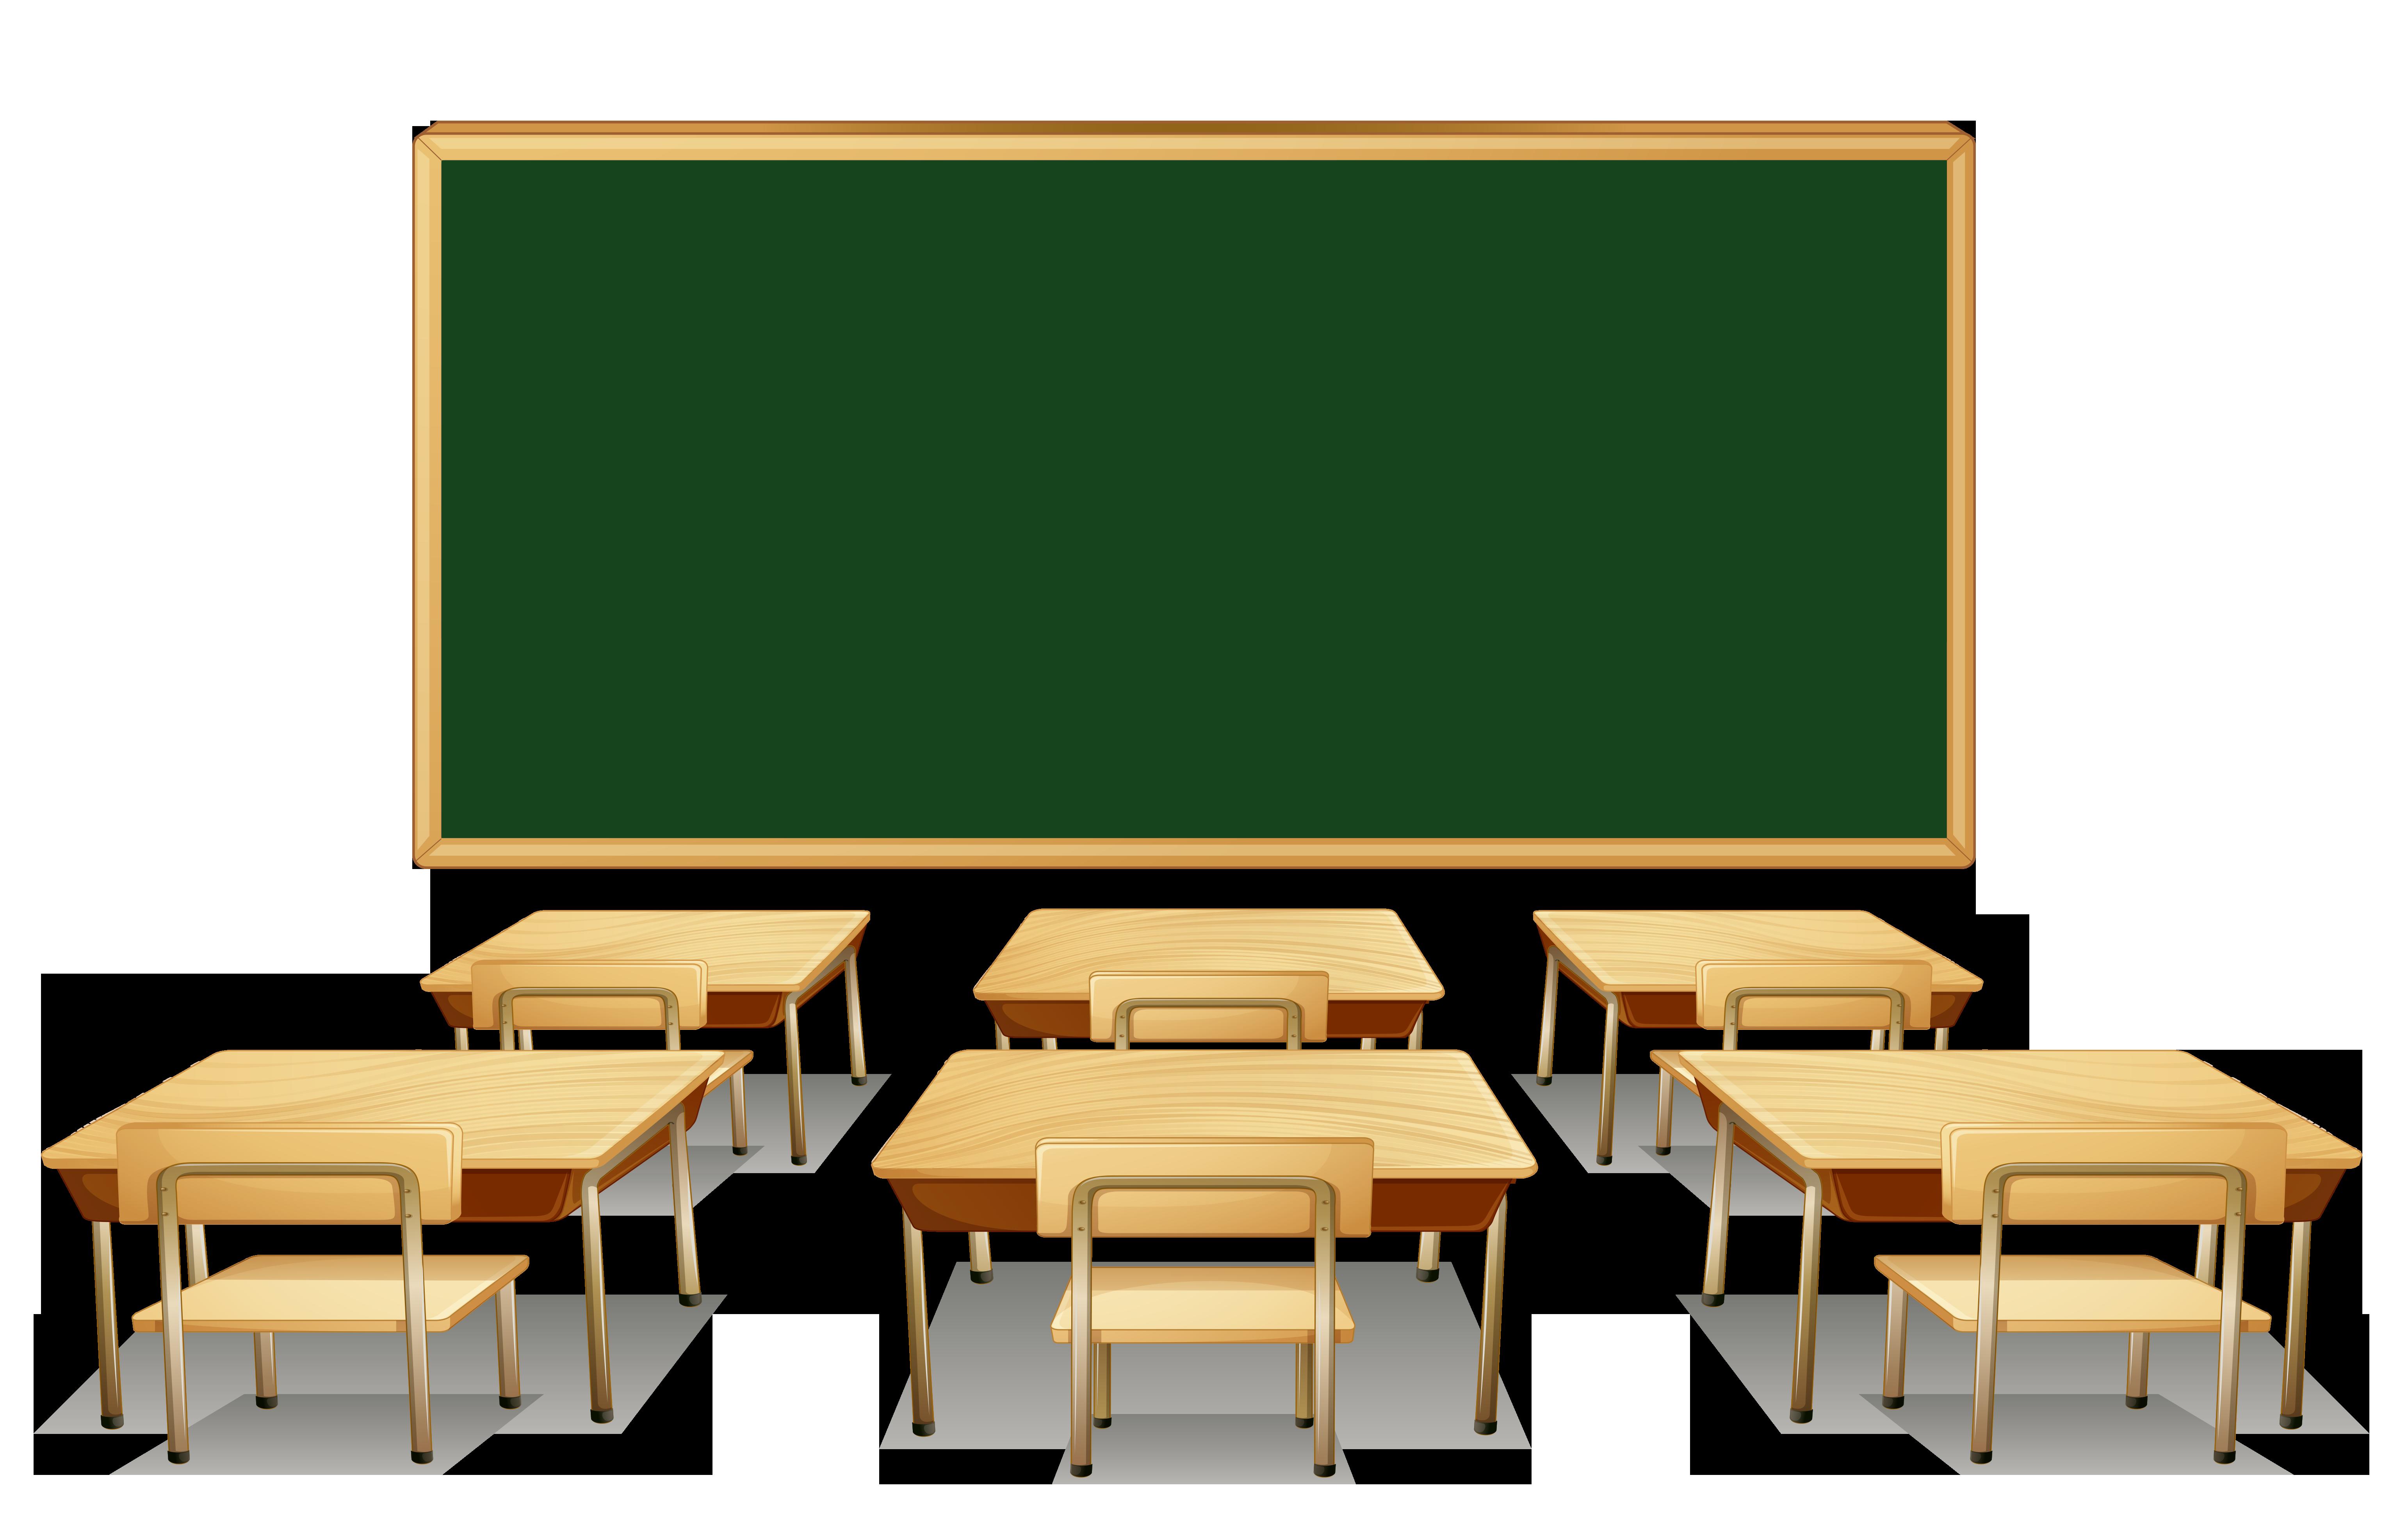 Desk clipart elementary school classroom Kindergarten  free classroom com